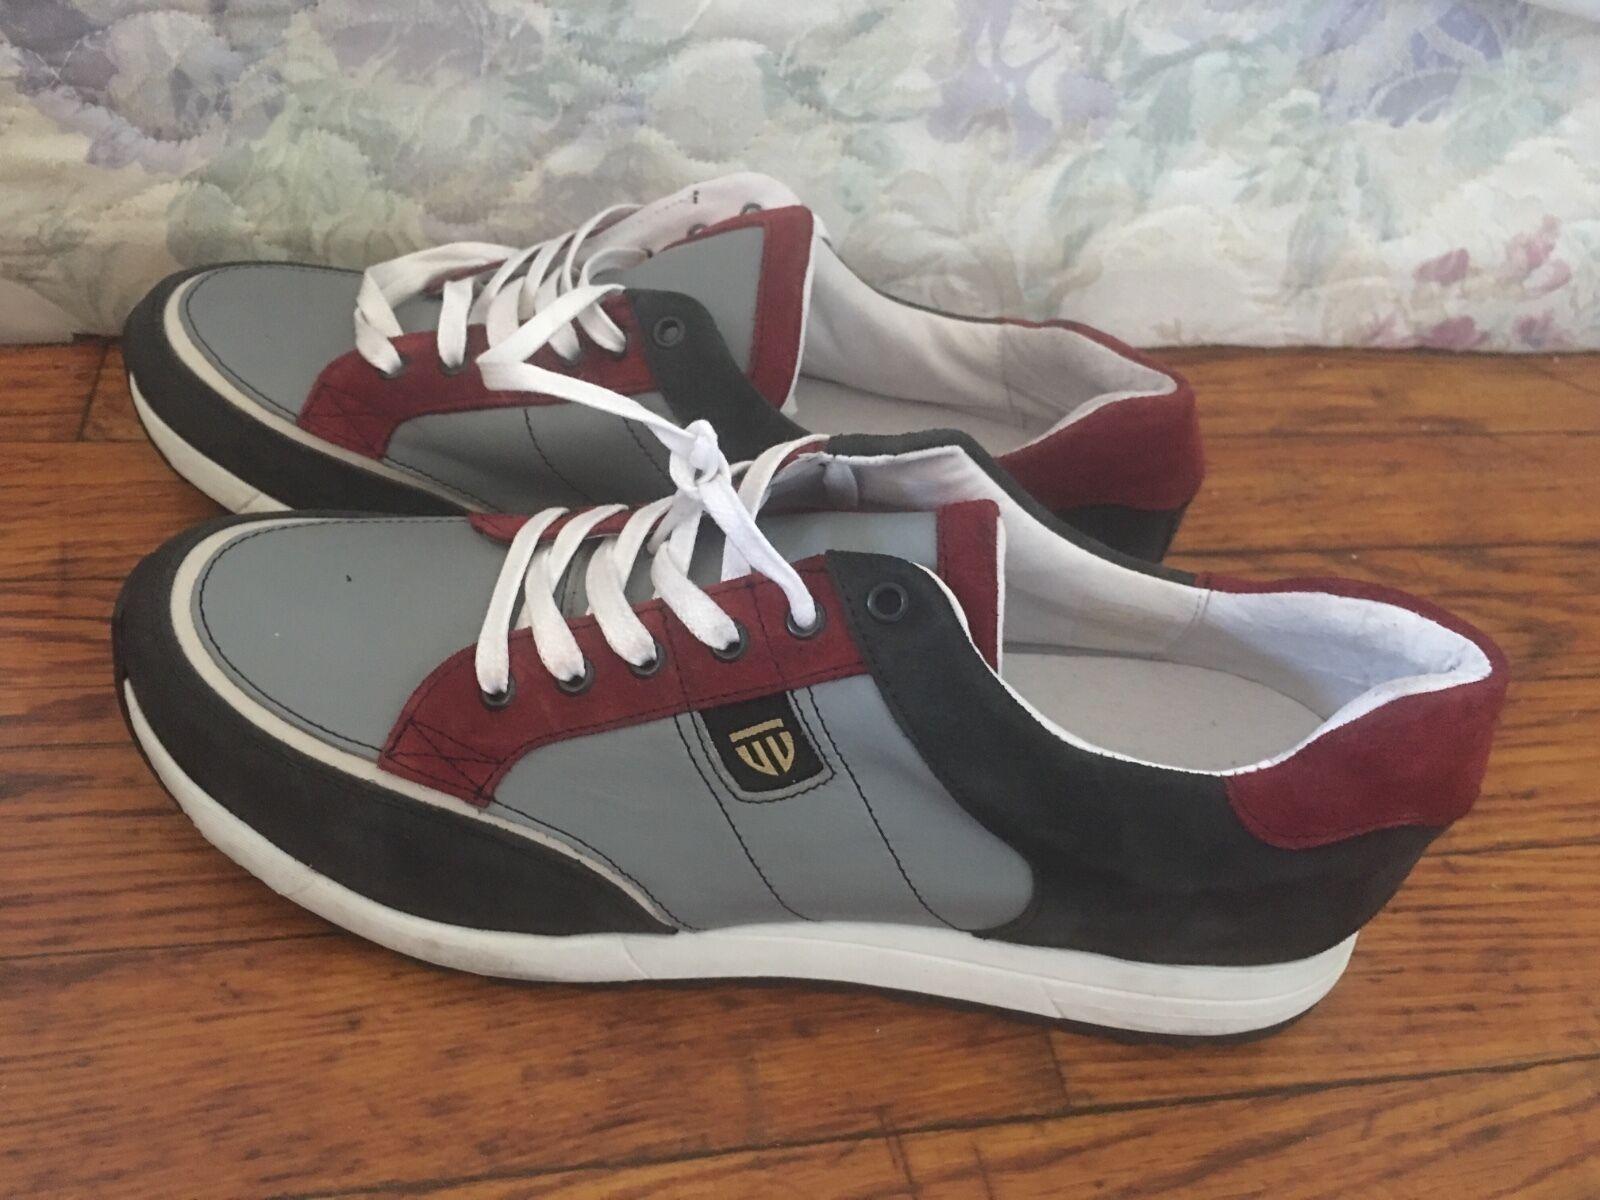 Scarpe casual da uomo True Measure designer uomos Fashion Sneakers Shoes 43